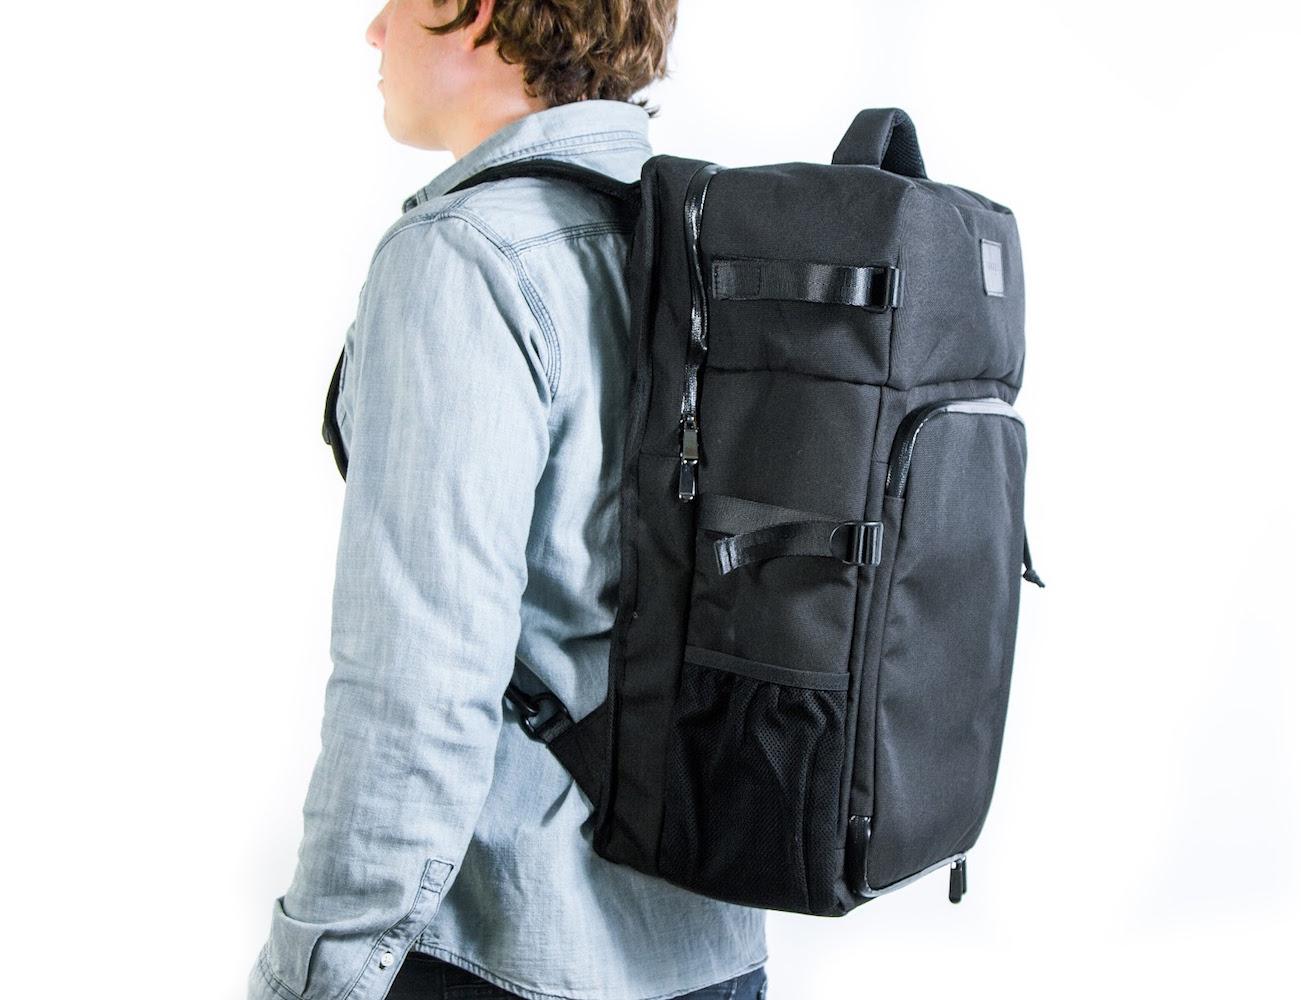 Progo+%26%238211%3B+A+Revolutionary+Carry-on+Or+Camera+Backpack